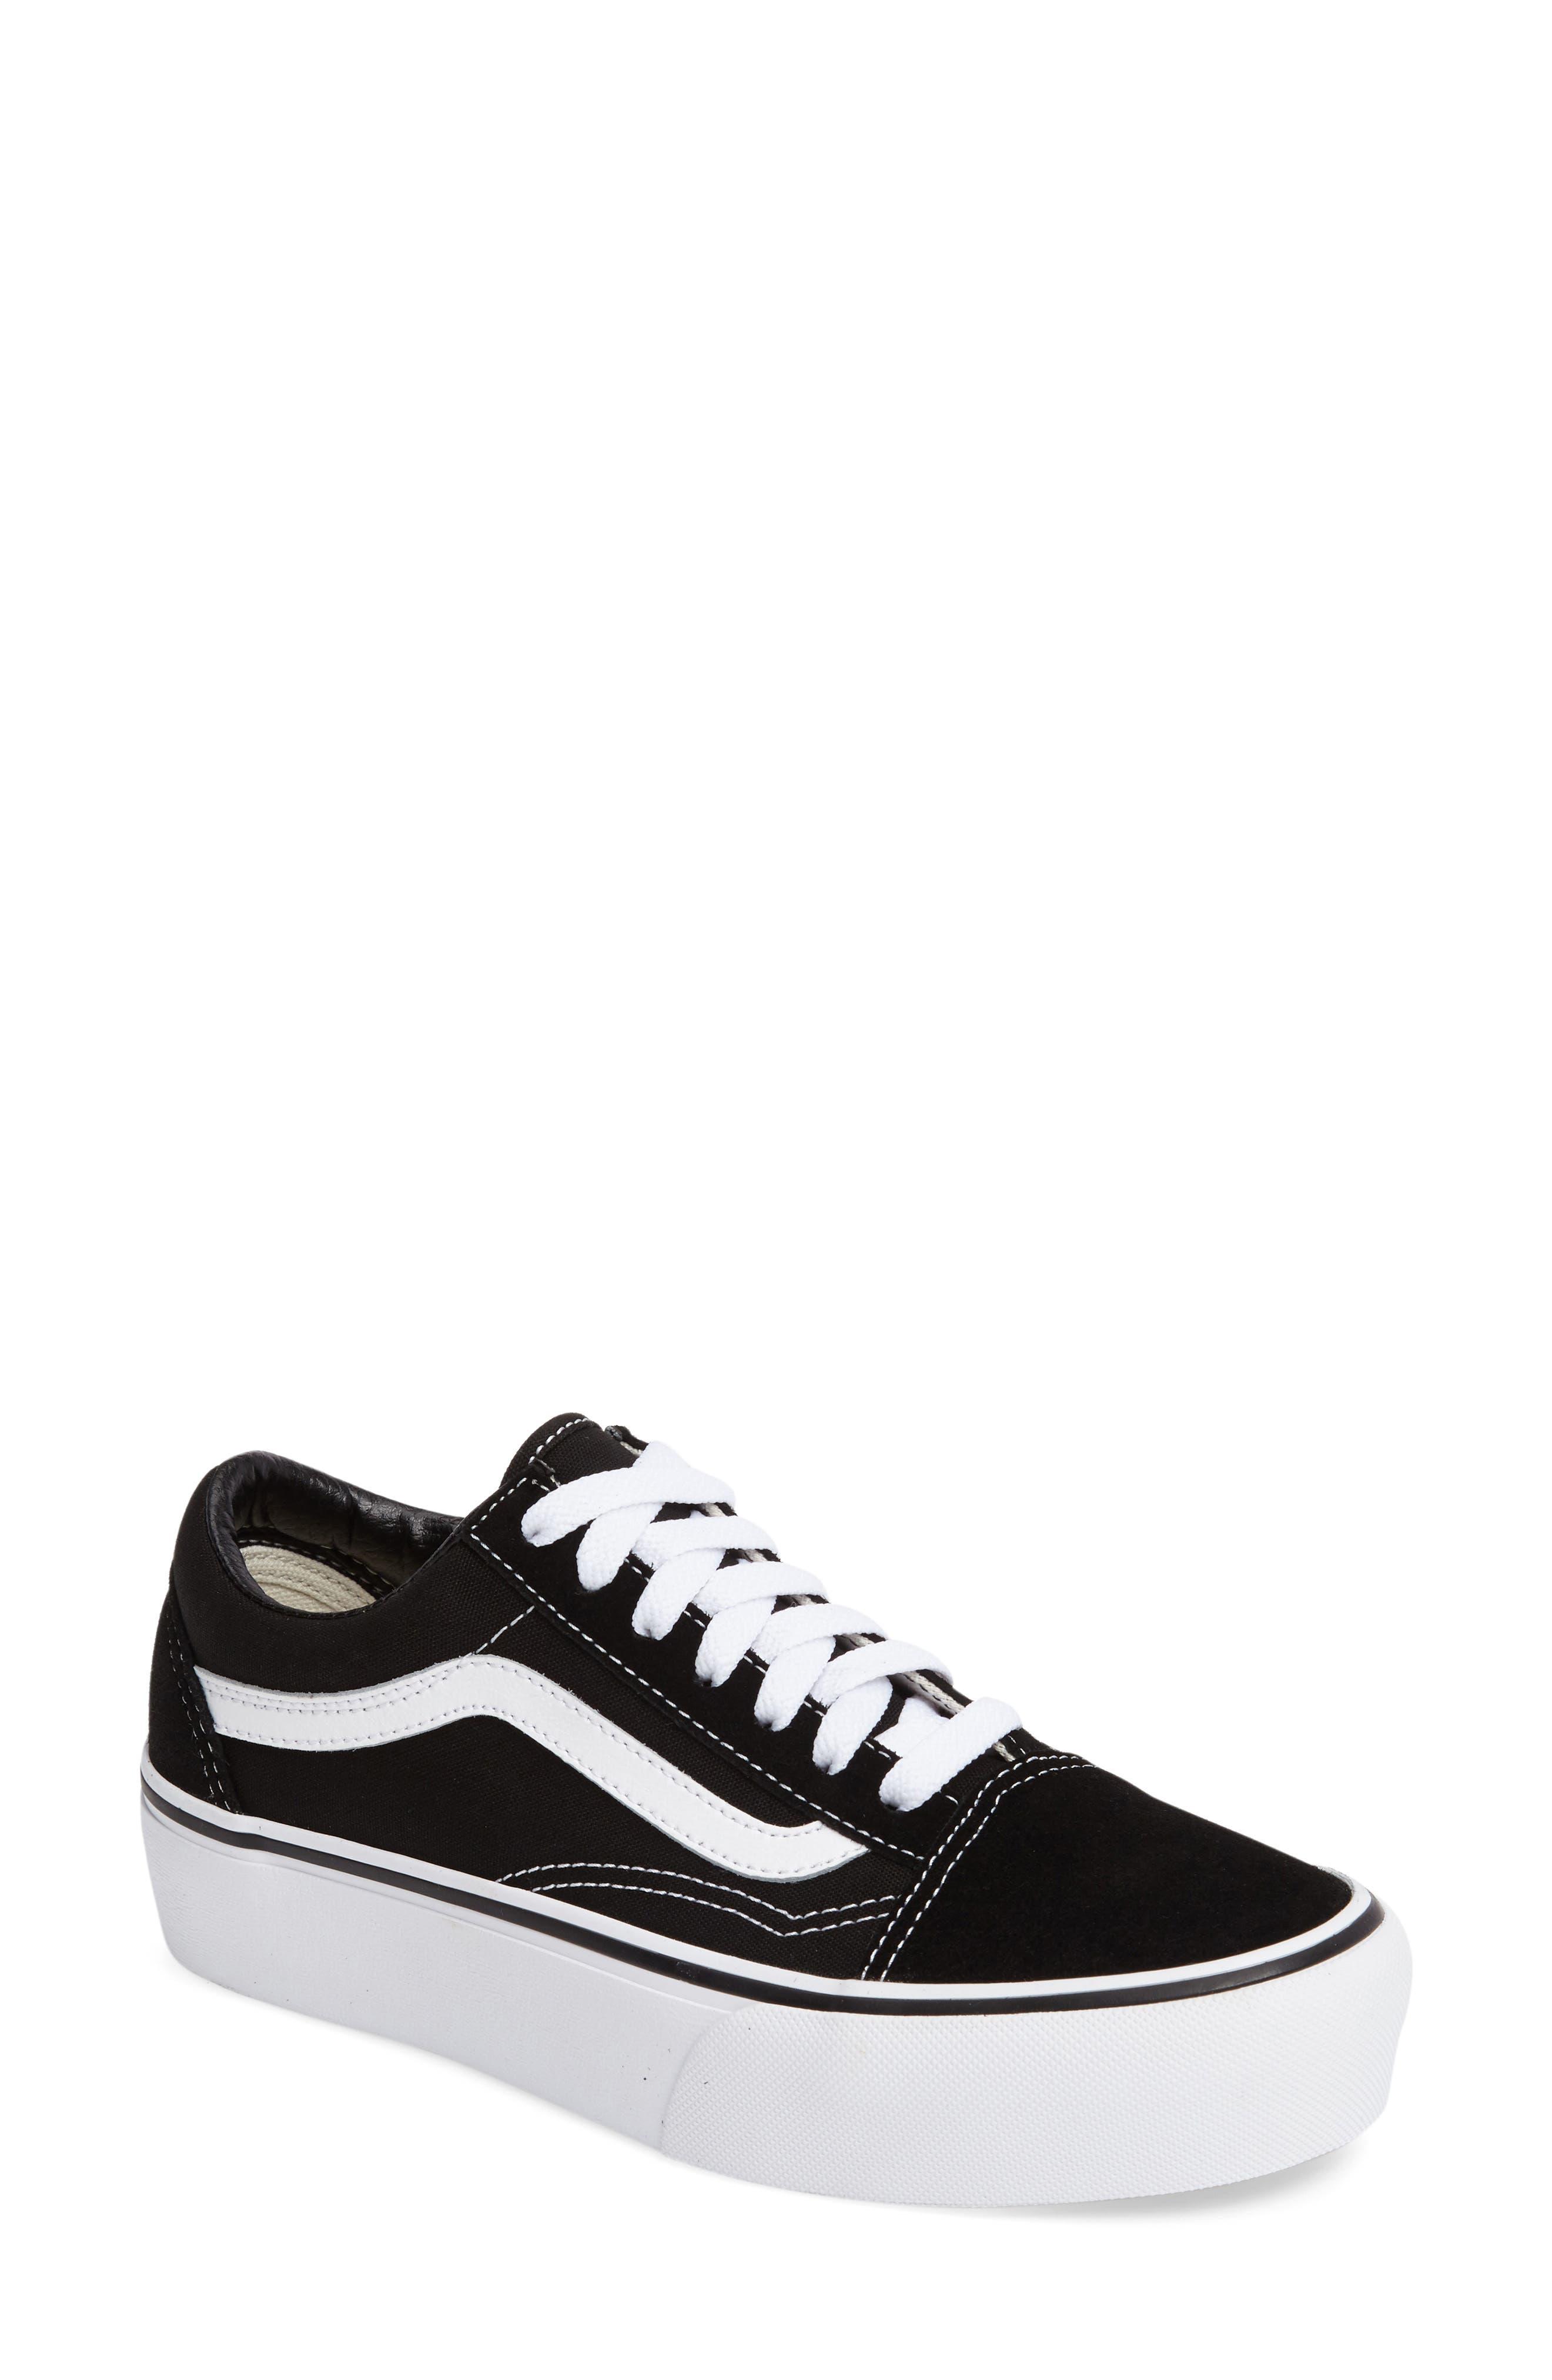 VANS Old Skool Platform Sneaker, Main, color, BLACK/ WHITE